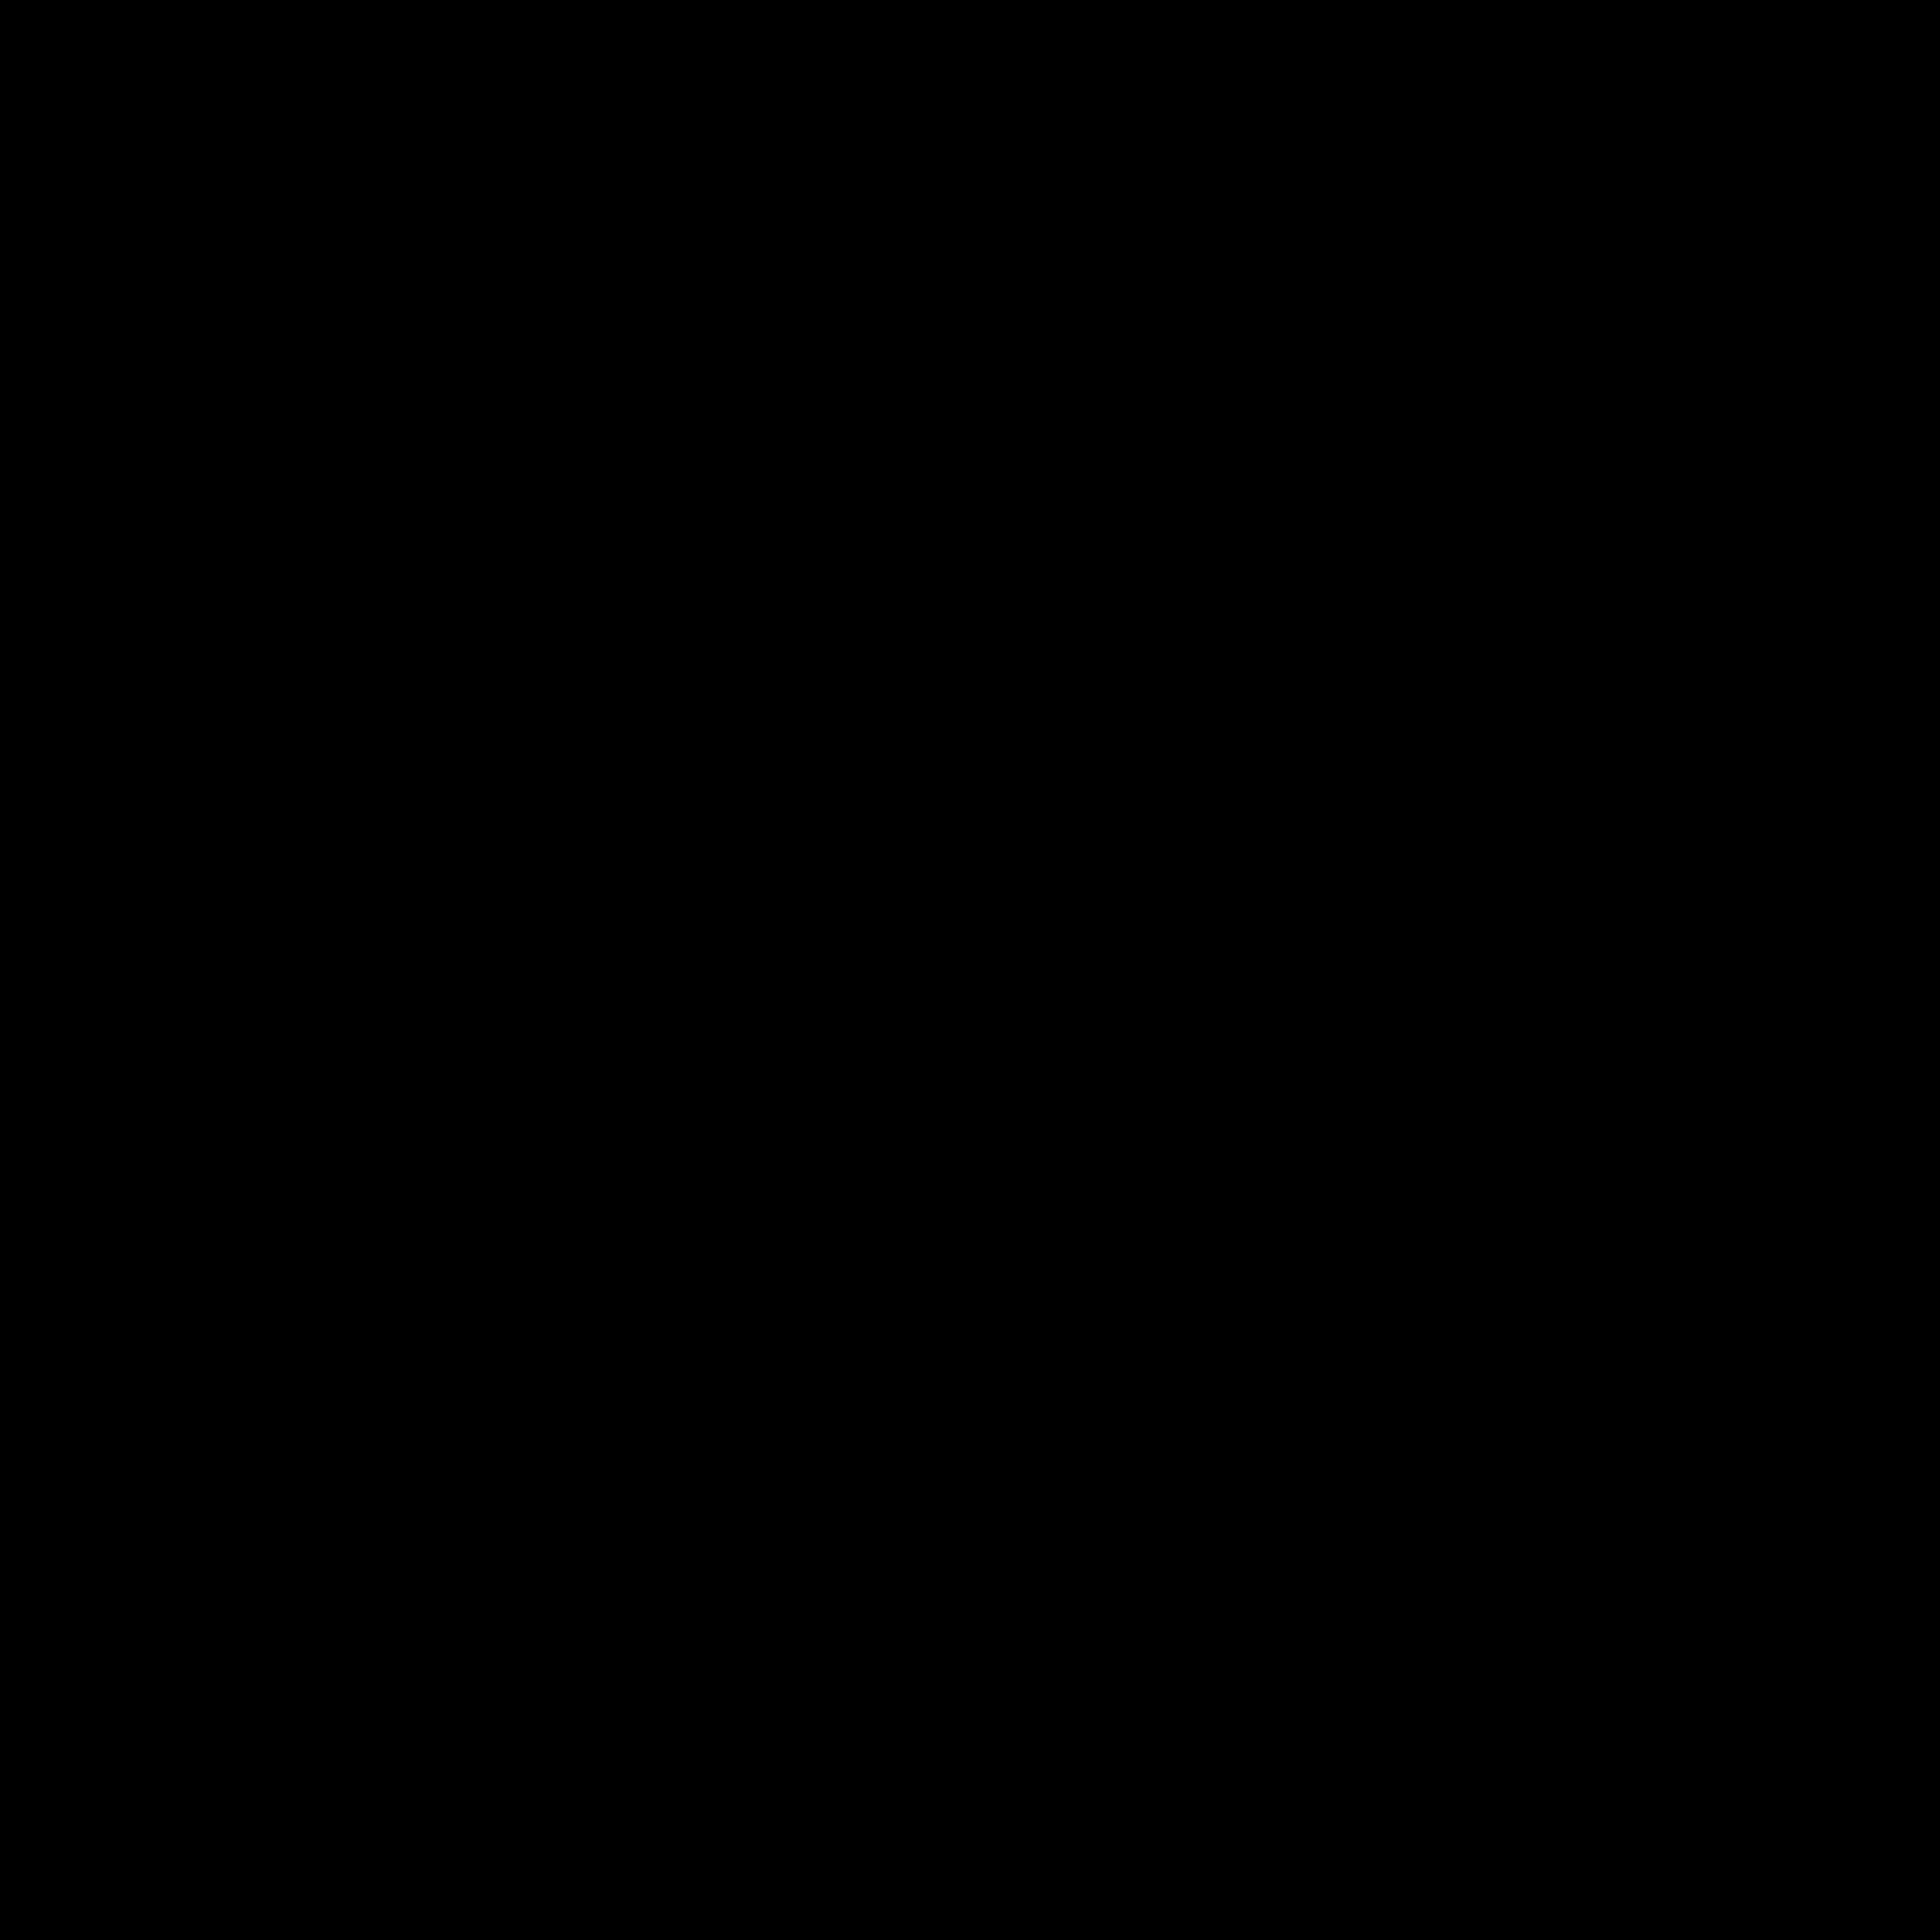 arcteryx-soho-logo black.png